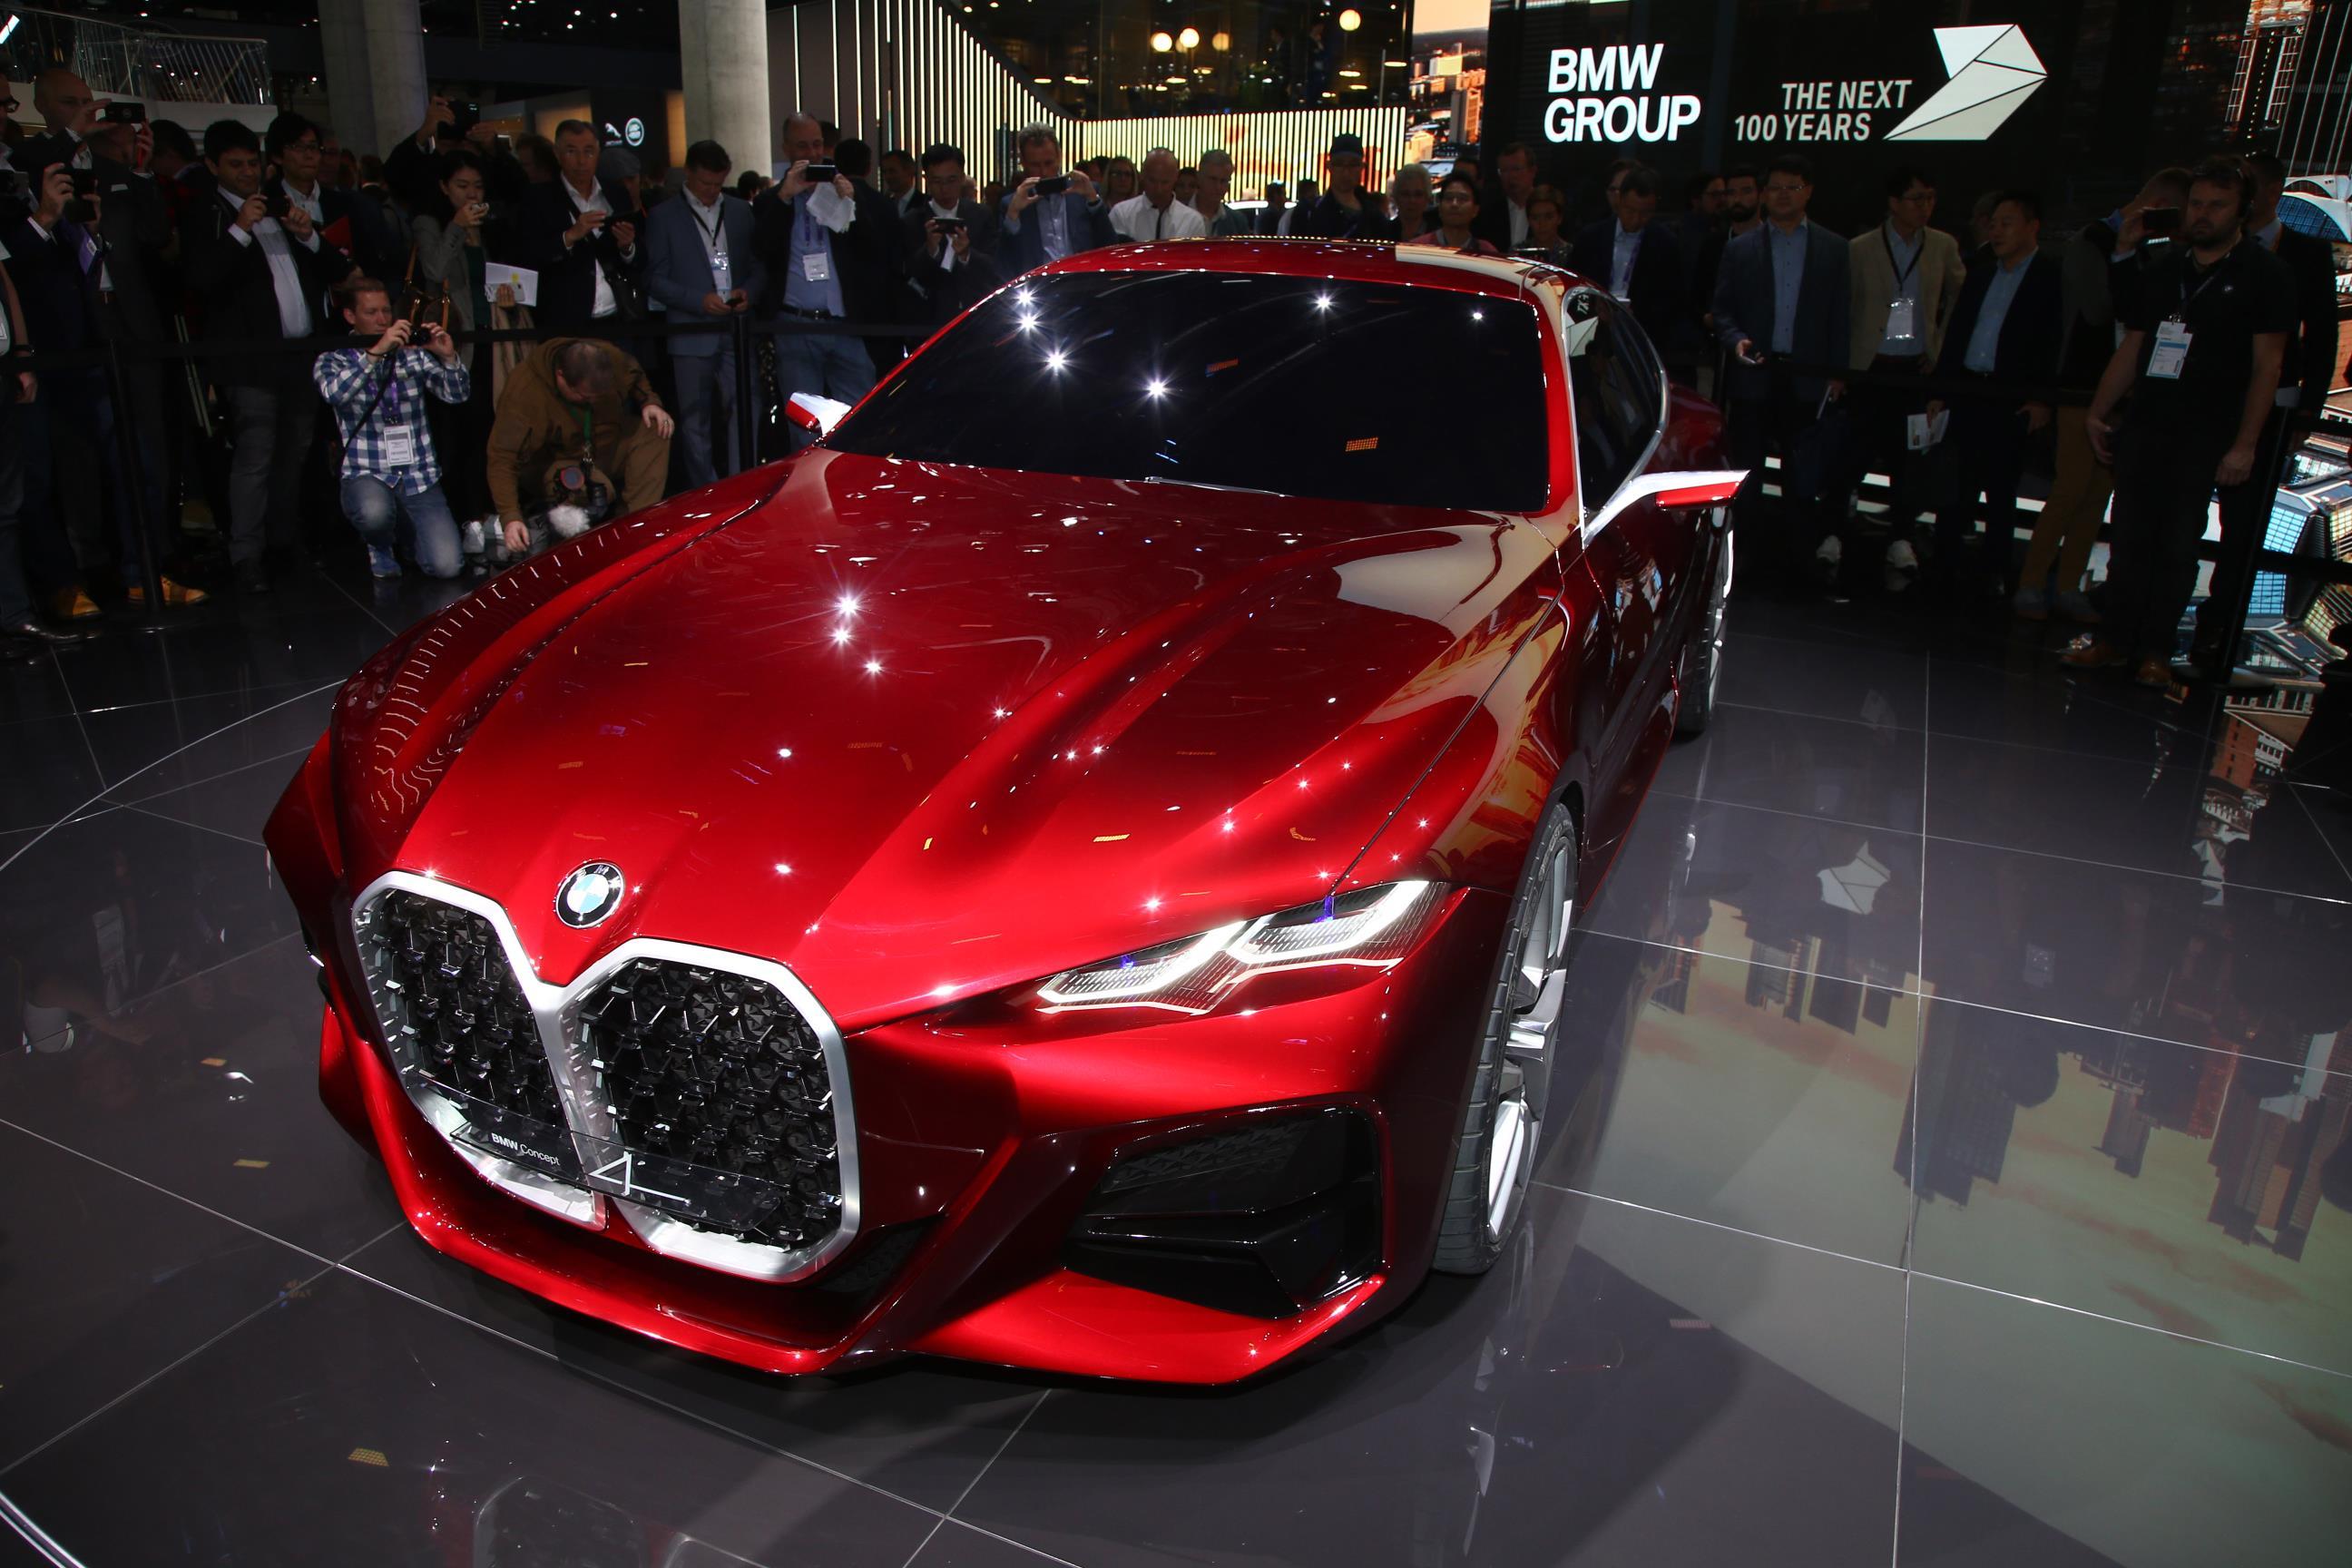 BMW Concept 4 Next M4